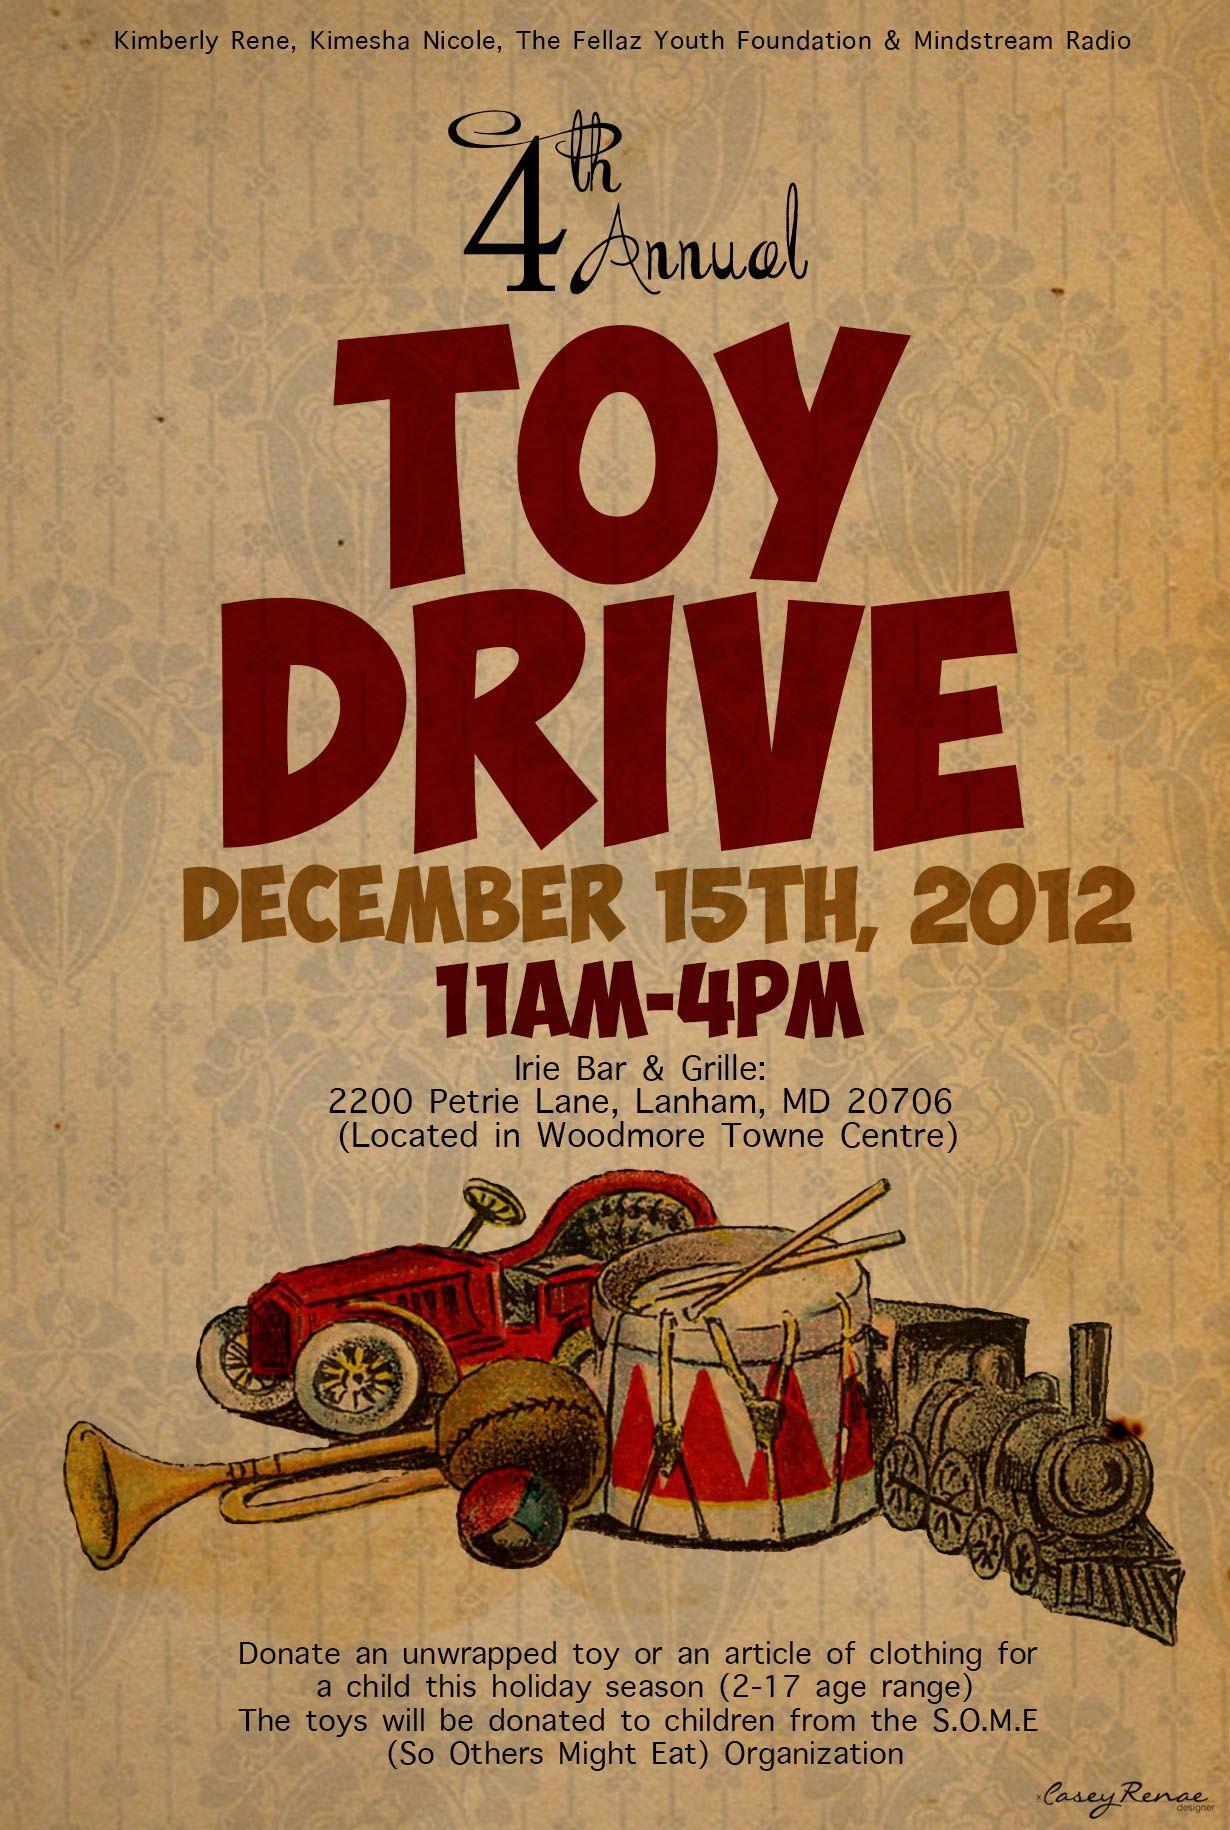 toy drive flyer by flyer design pinterest toy grandparents and. Black Bedroom Furniture Sets. Home Design Ideas